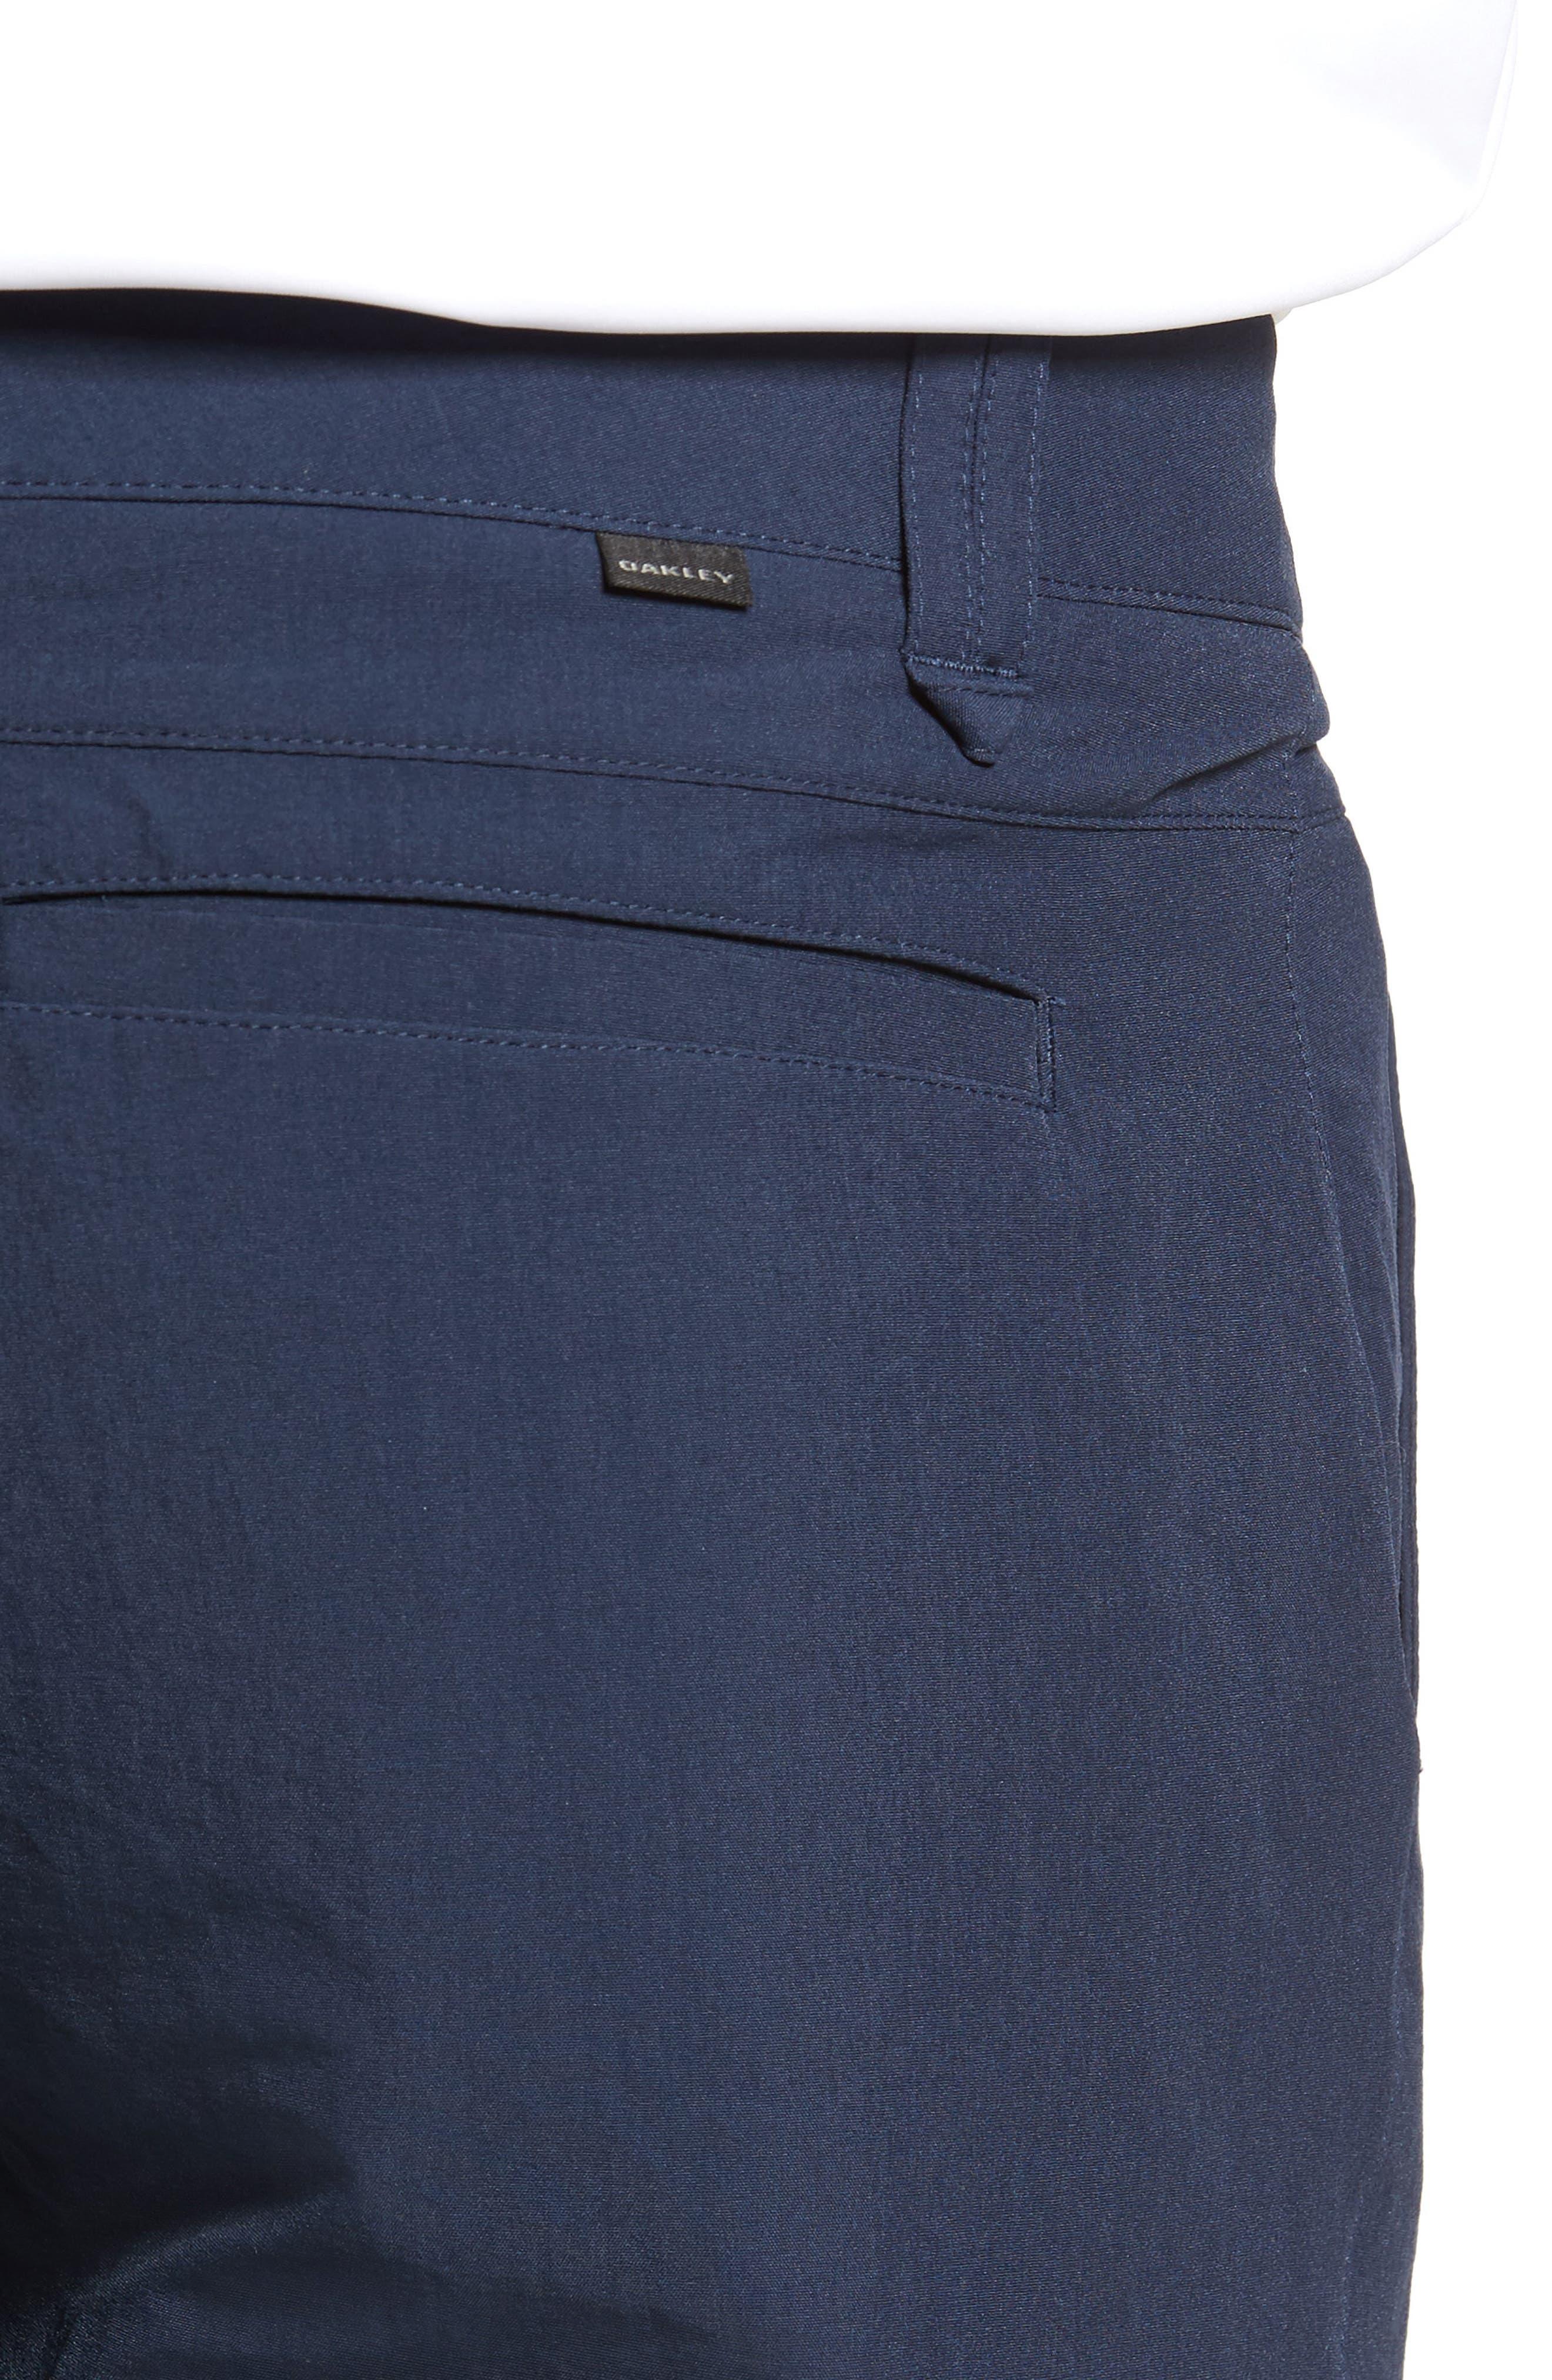 Take 2.5 Shorts,                             Alternate thumbnail 4, color,                             Fathom